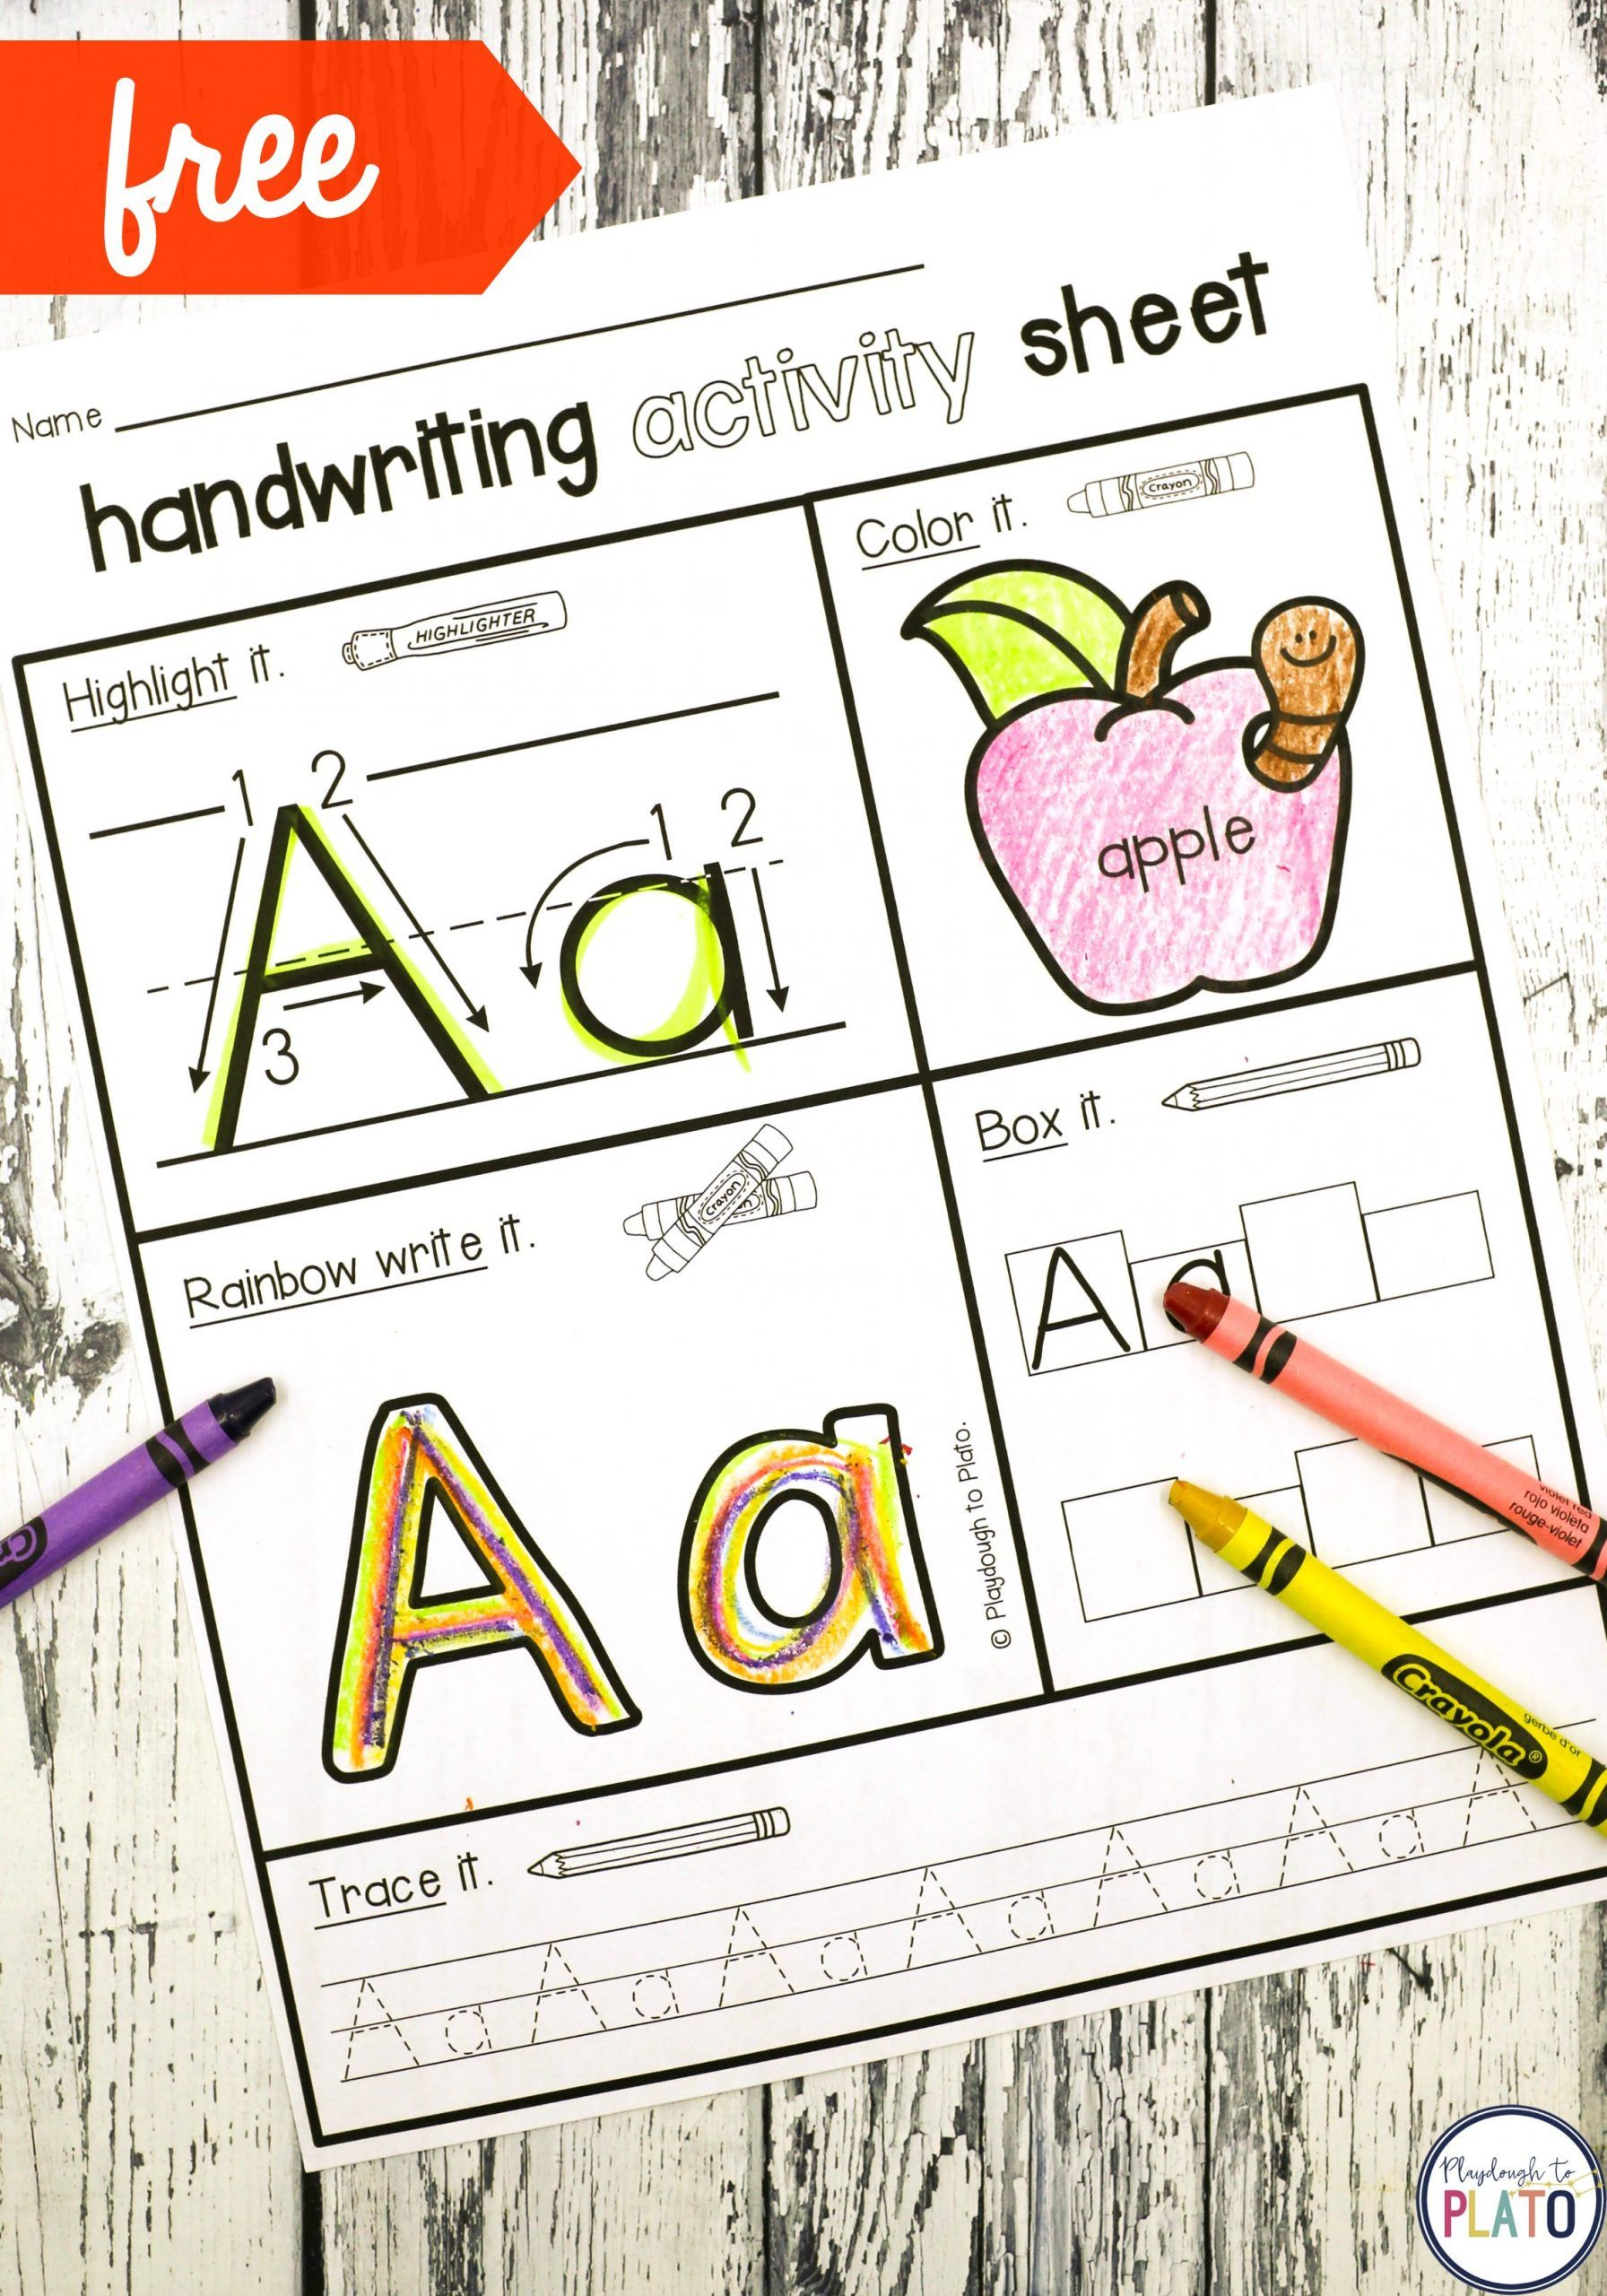 D Nealian Handwriting Practice Worksheets Handwriting Activity Pages Playdough To Plato Handwriting Activities Free Handwriting Activity Sheets